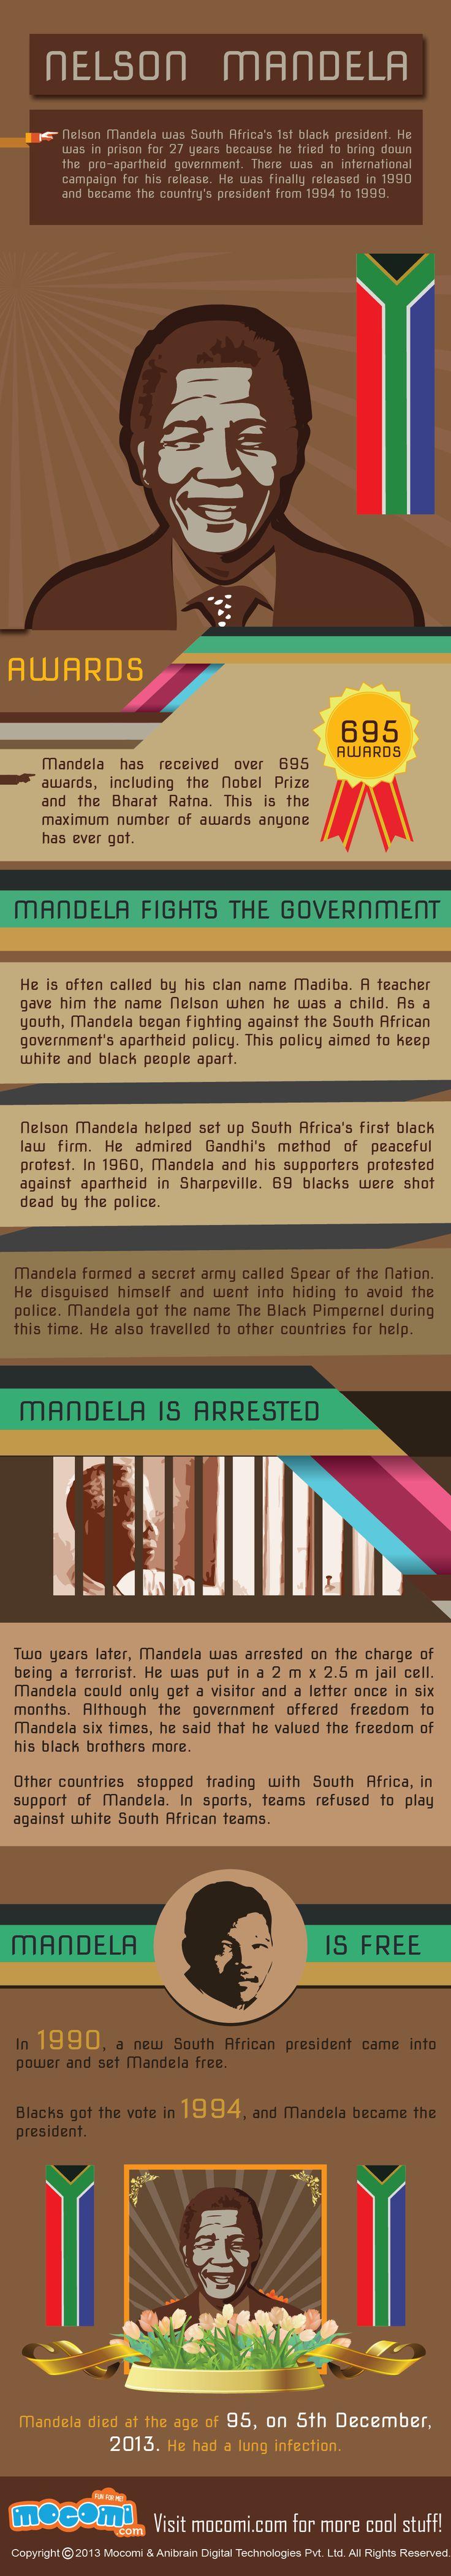 Nelson Mandela was South Africa's 1st black president. He received over 695 awards, including the Nobel Prize and Bharat Ratna. Nelson Mandela Biography - http://mocomi.com/nelson-mandela-biography/